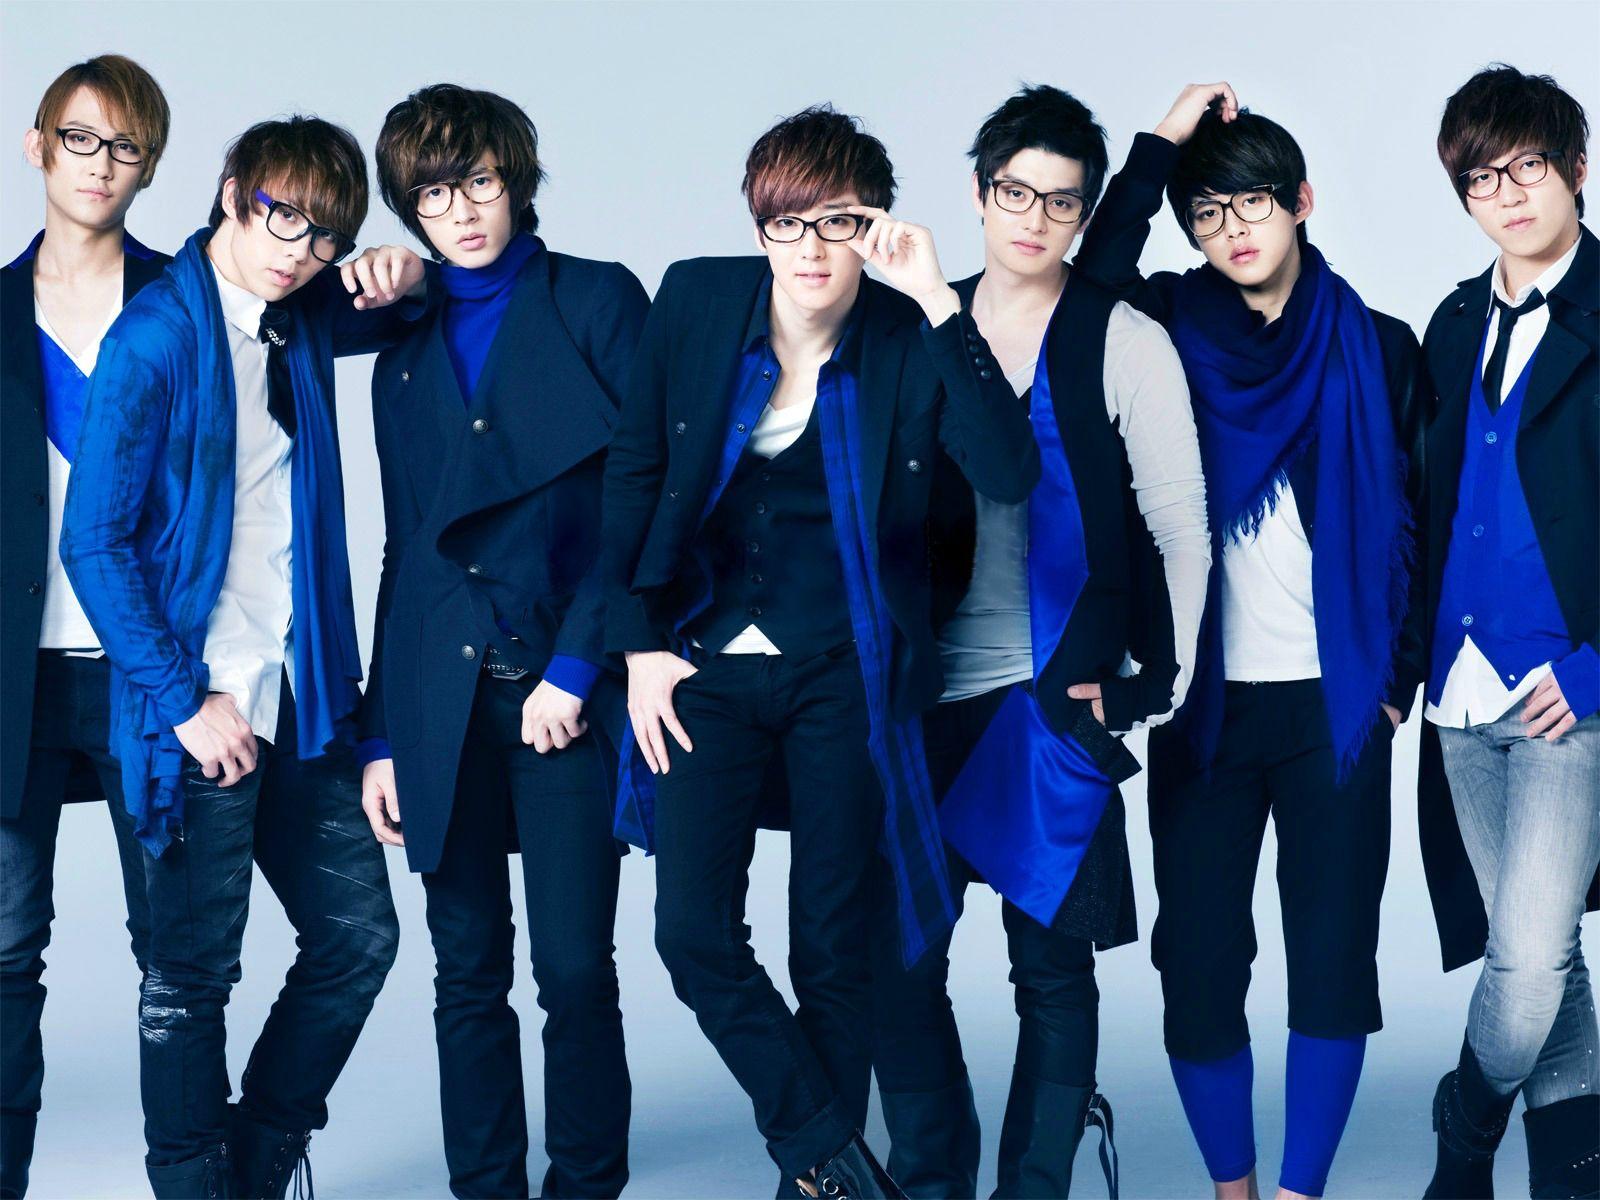 Photos Sponsor 120224 U Kiss For Zoff X U Kiss Promotional Campaign U Kiss Korean Bands Korean Pop